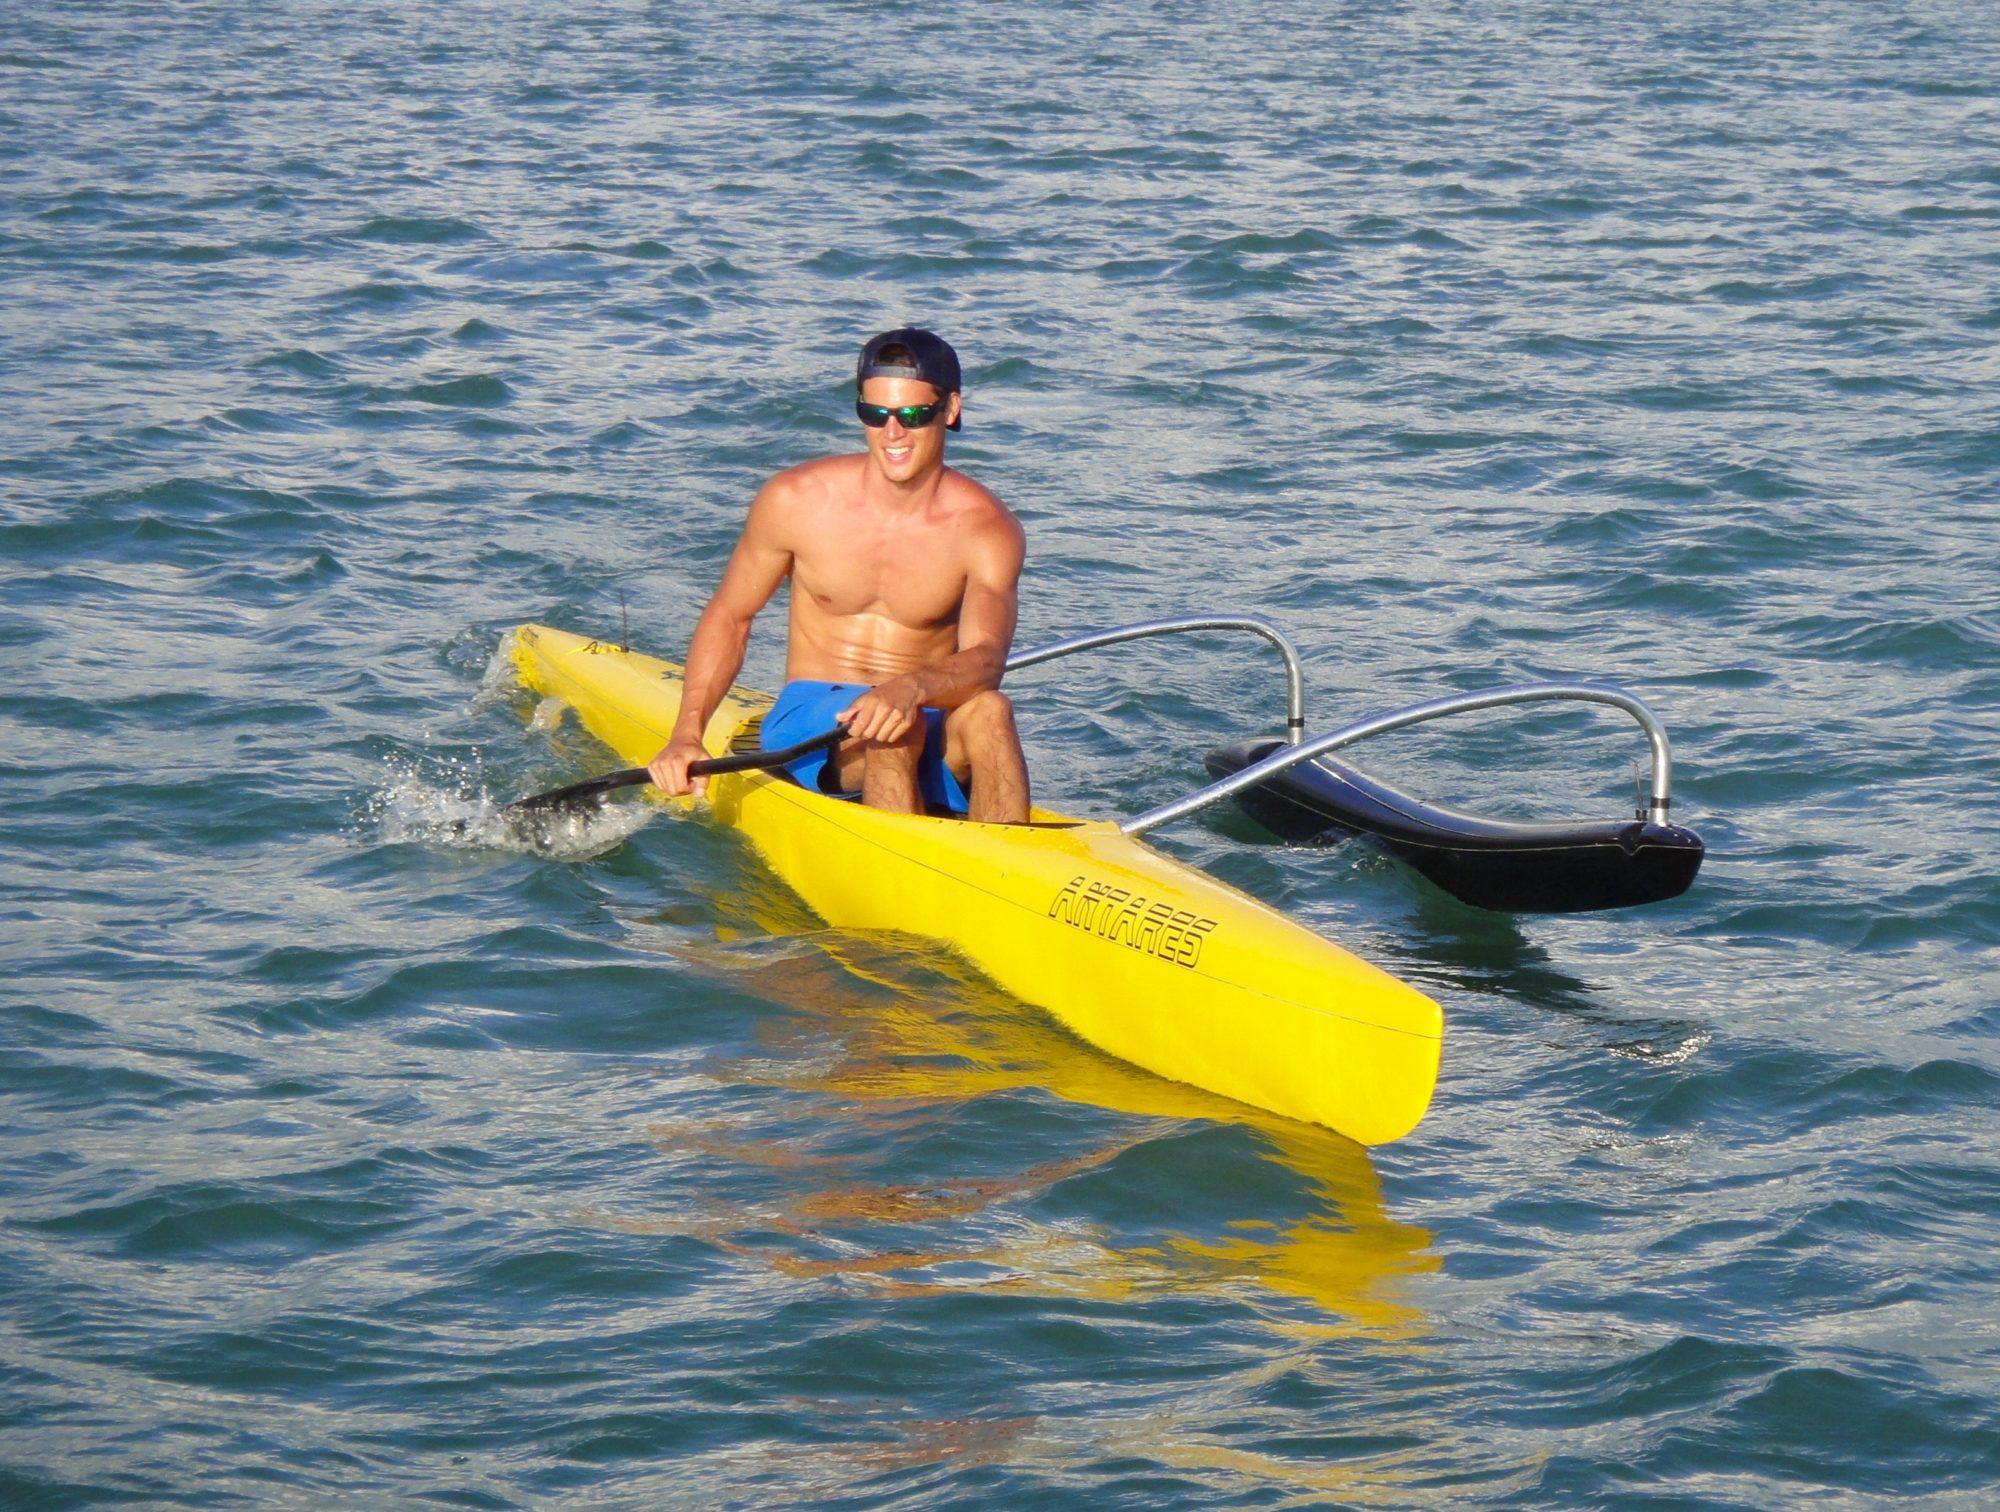 Kilakila Water Sports